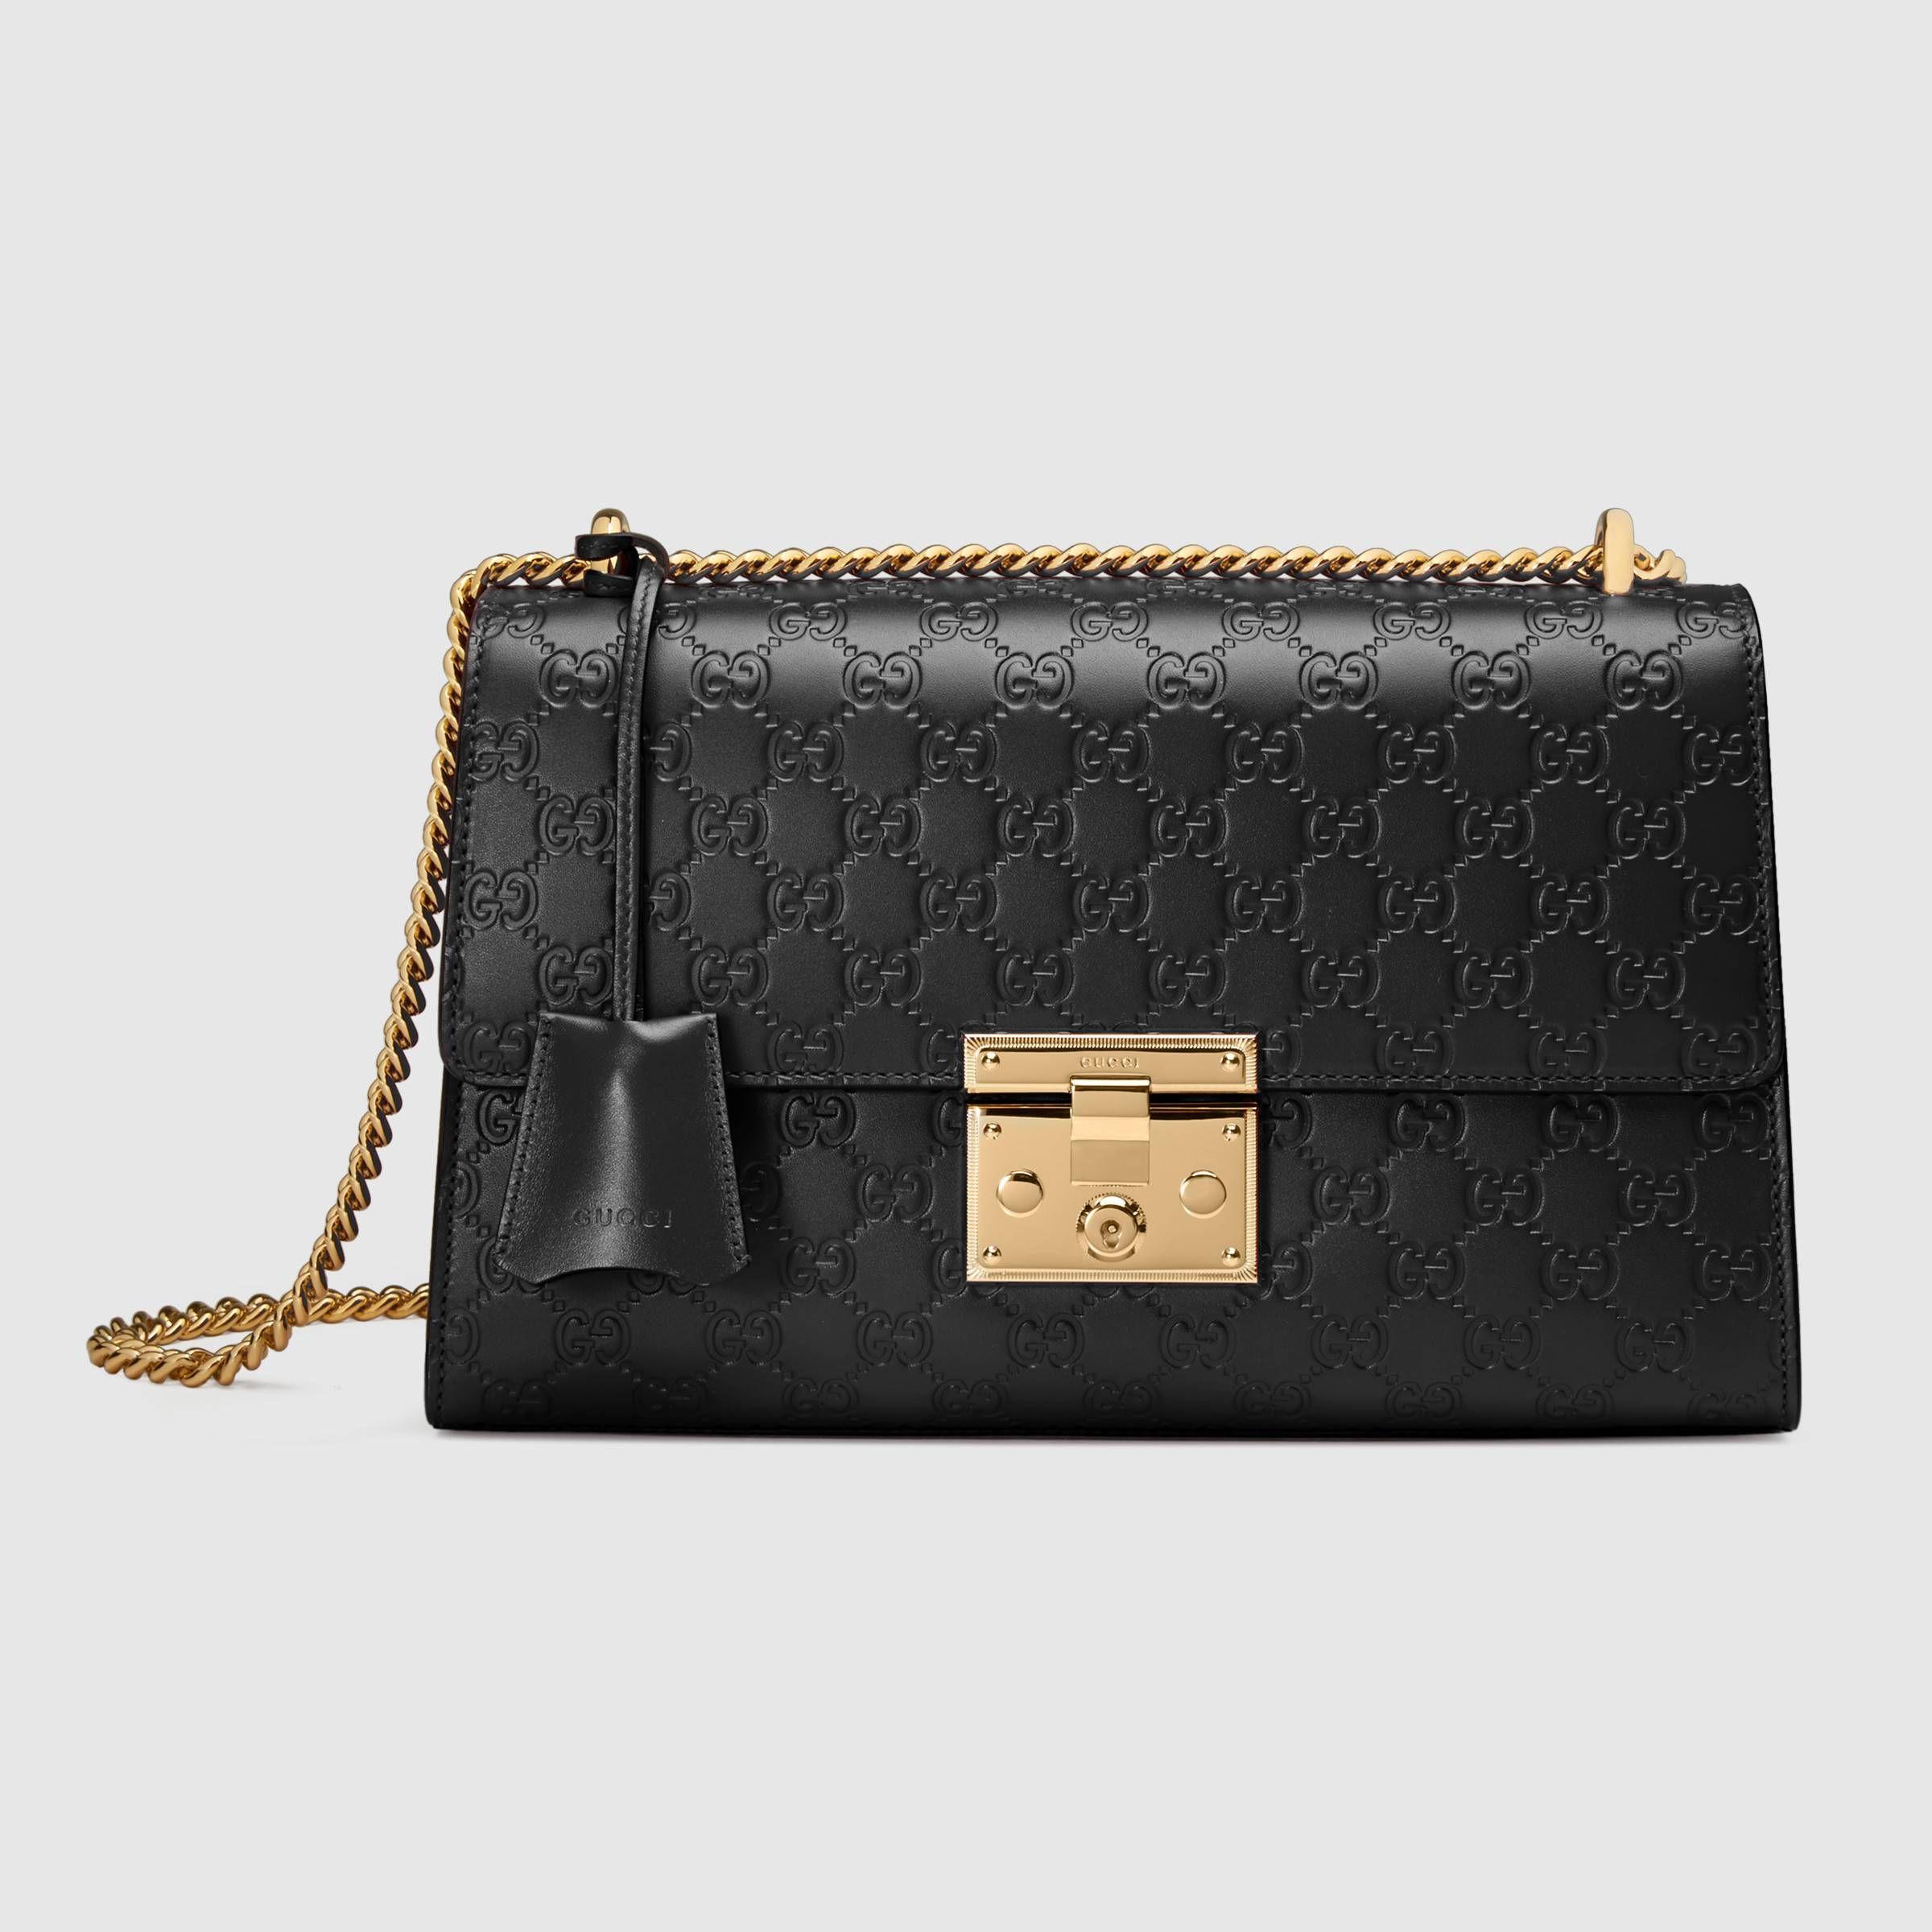 2e301308706 Padlock medium Gucci Signature shoulder bag in Black Gucci Signature leather